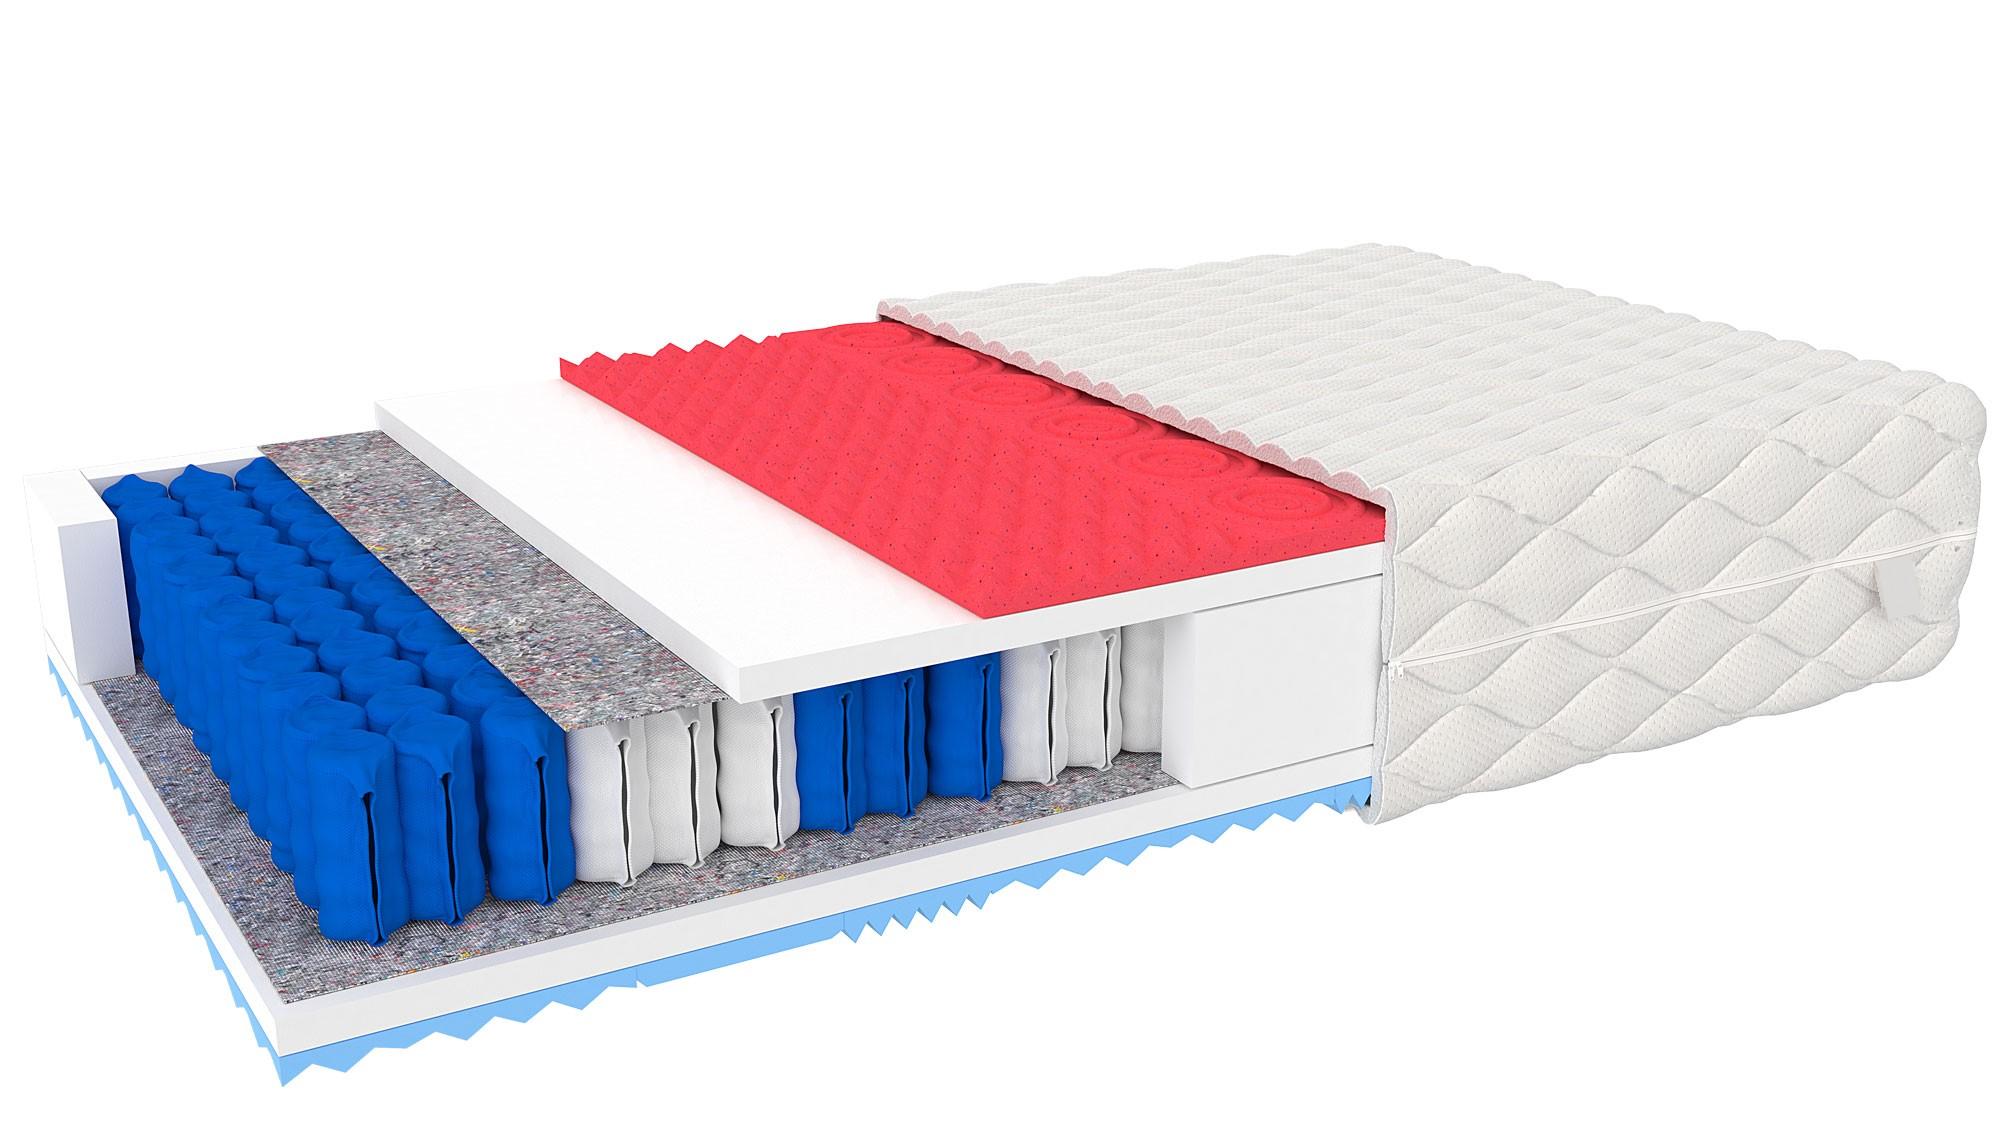 Angel Foam Taschenfederkern Matratze Venci 80x200